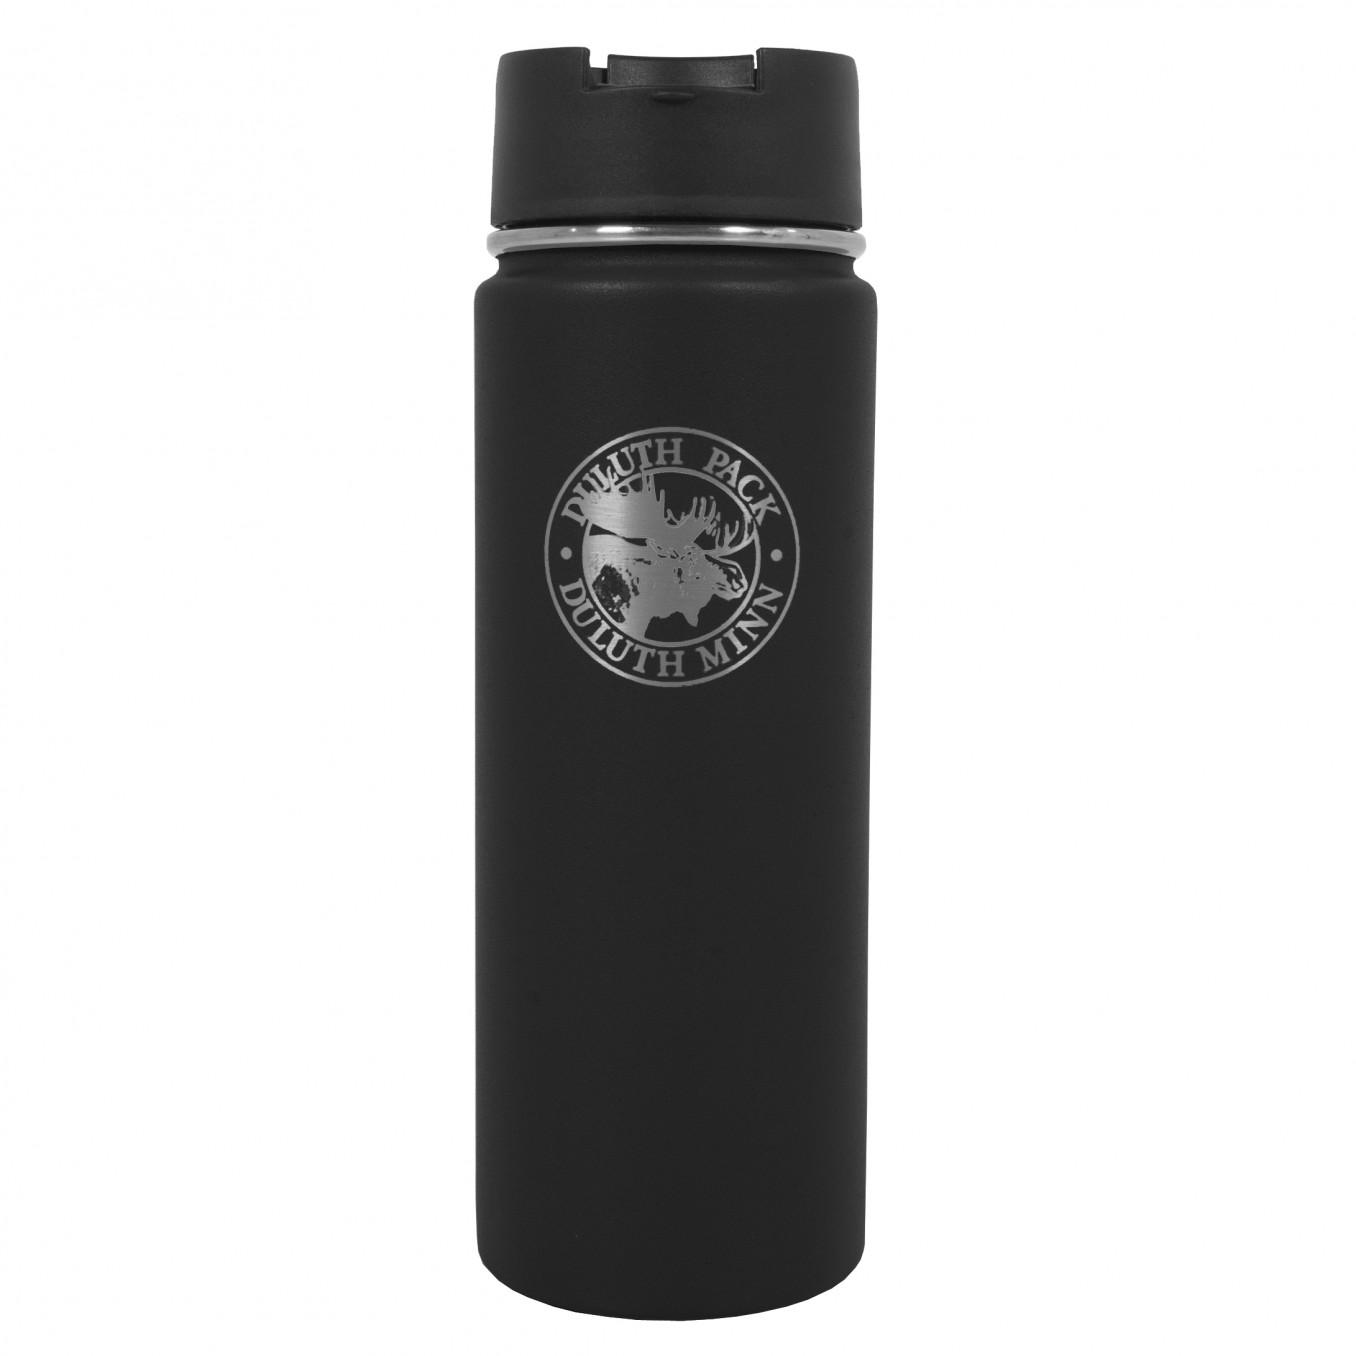 Hydro Flask 20oz Wide Mouth Coffee Mug - $20.79